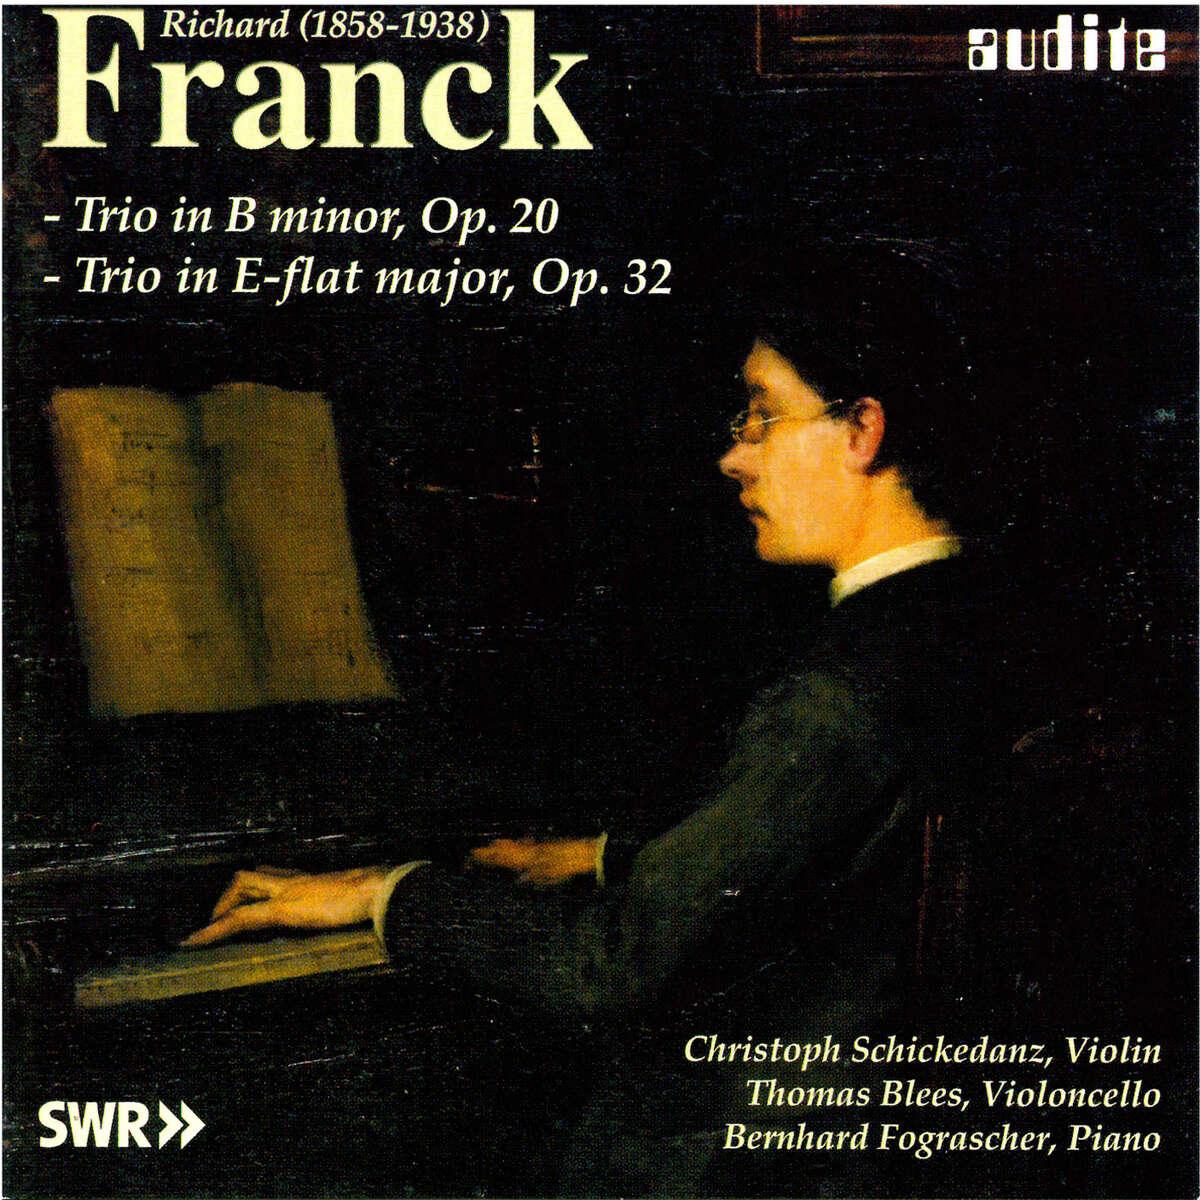 R. Franck: Piano Trio Op. 20 & Op. 32